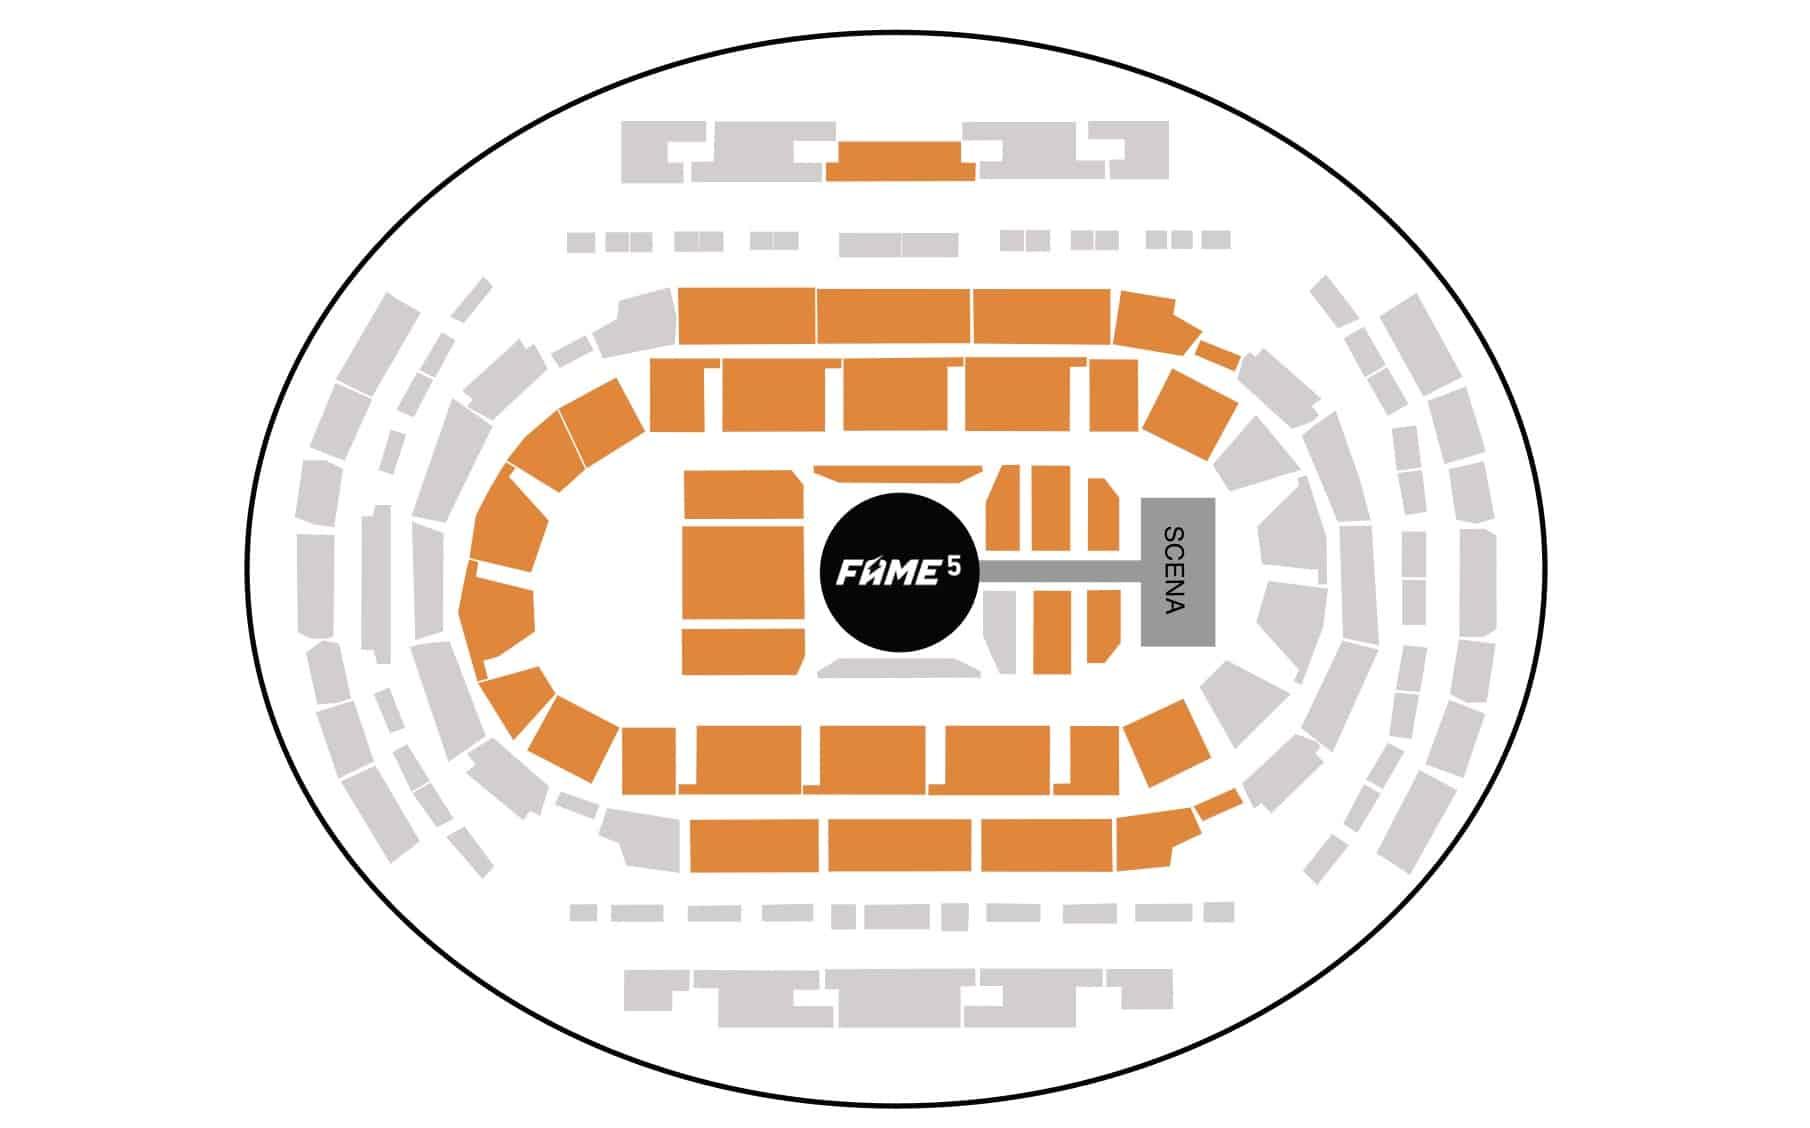 FAME MMA 5. Bilety, kursy bukmacherskie, transmisja